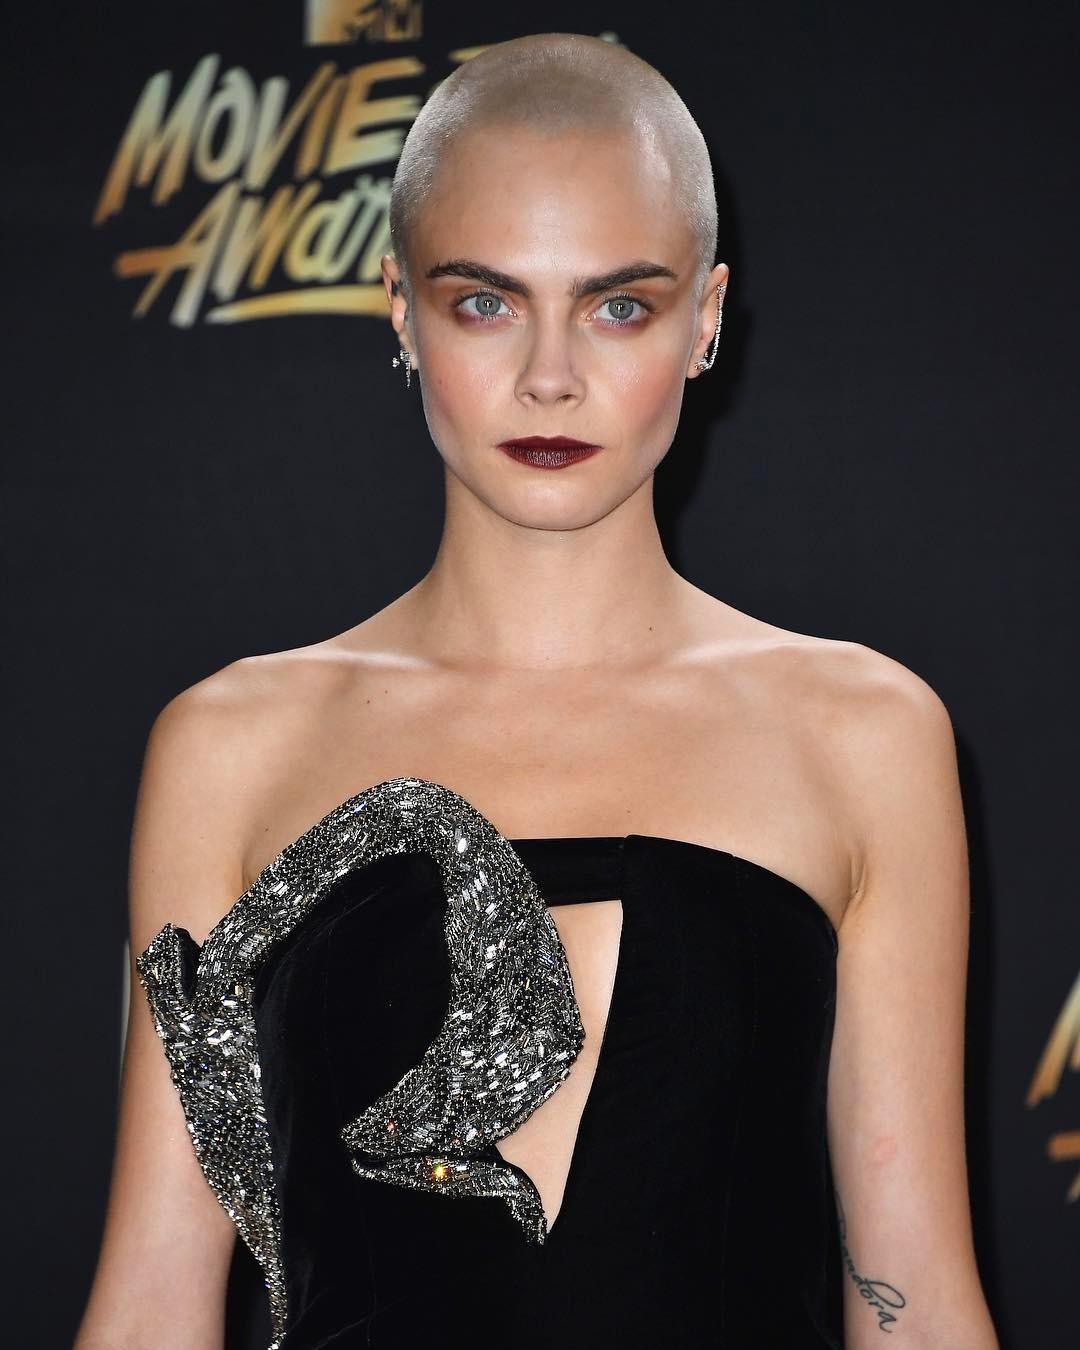 Hot or not: Cara Delevingne łysa i z tatuażem na głowie [SONDA]